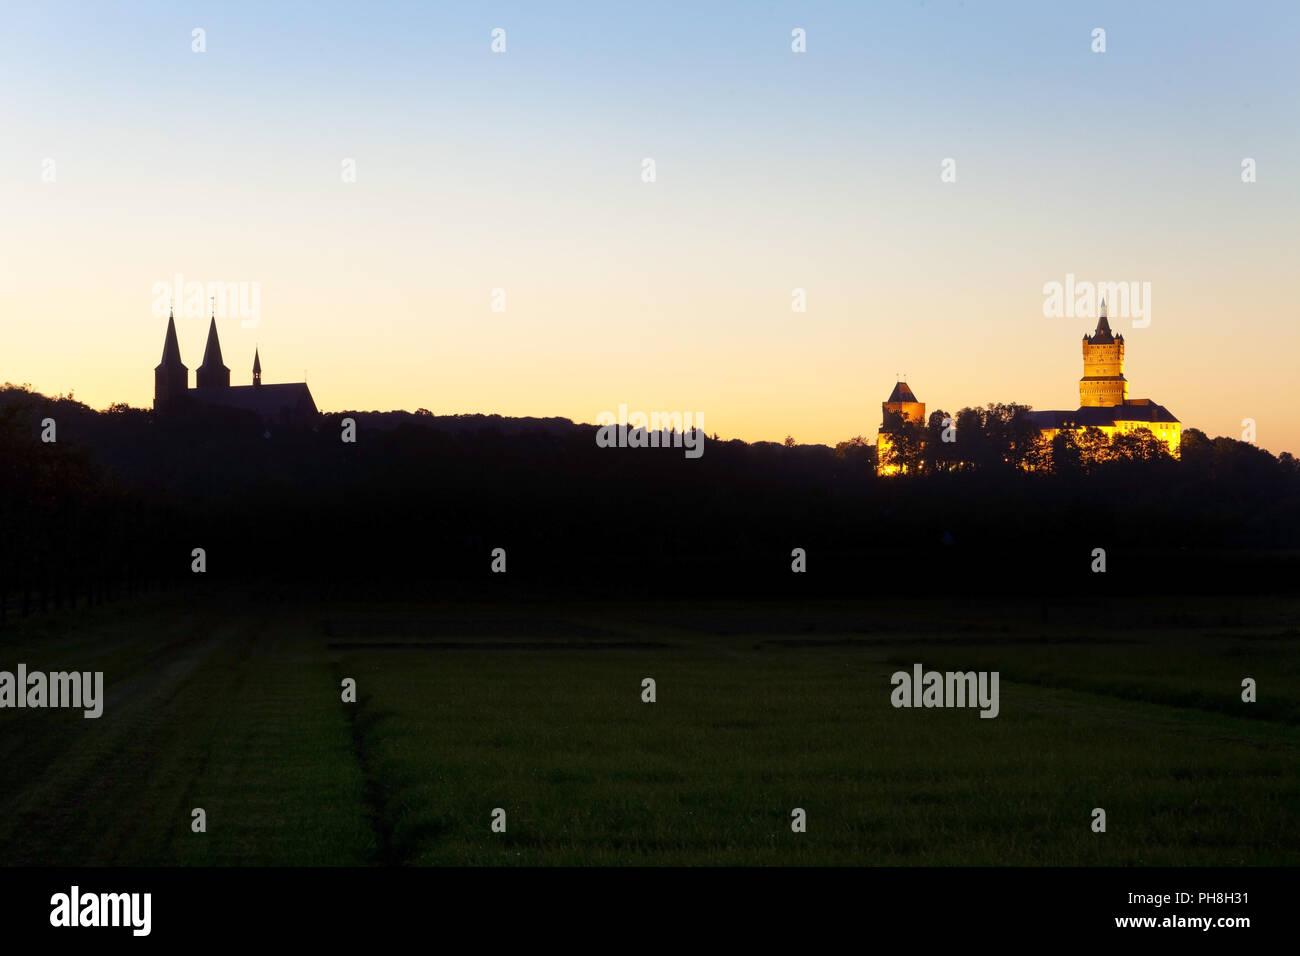 Stiftskirche with illuminated Schwanenburg, Kleve - Stock Image